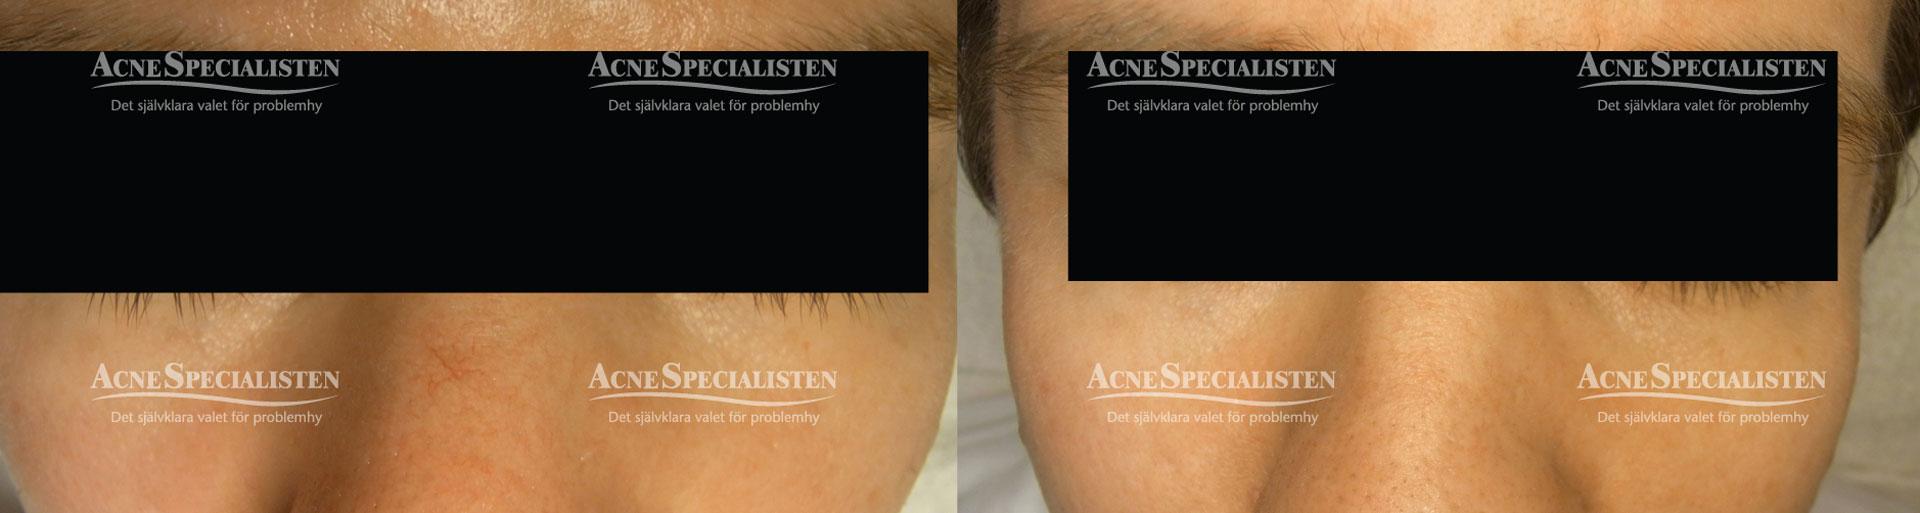 acnespecialisten